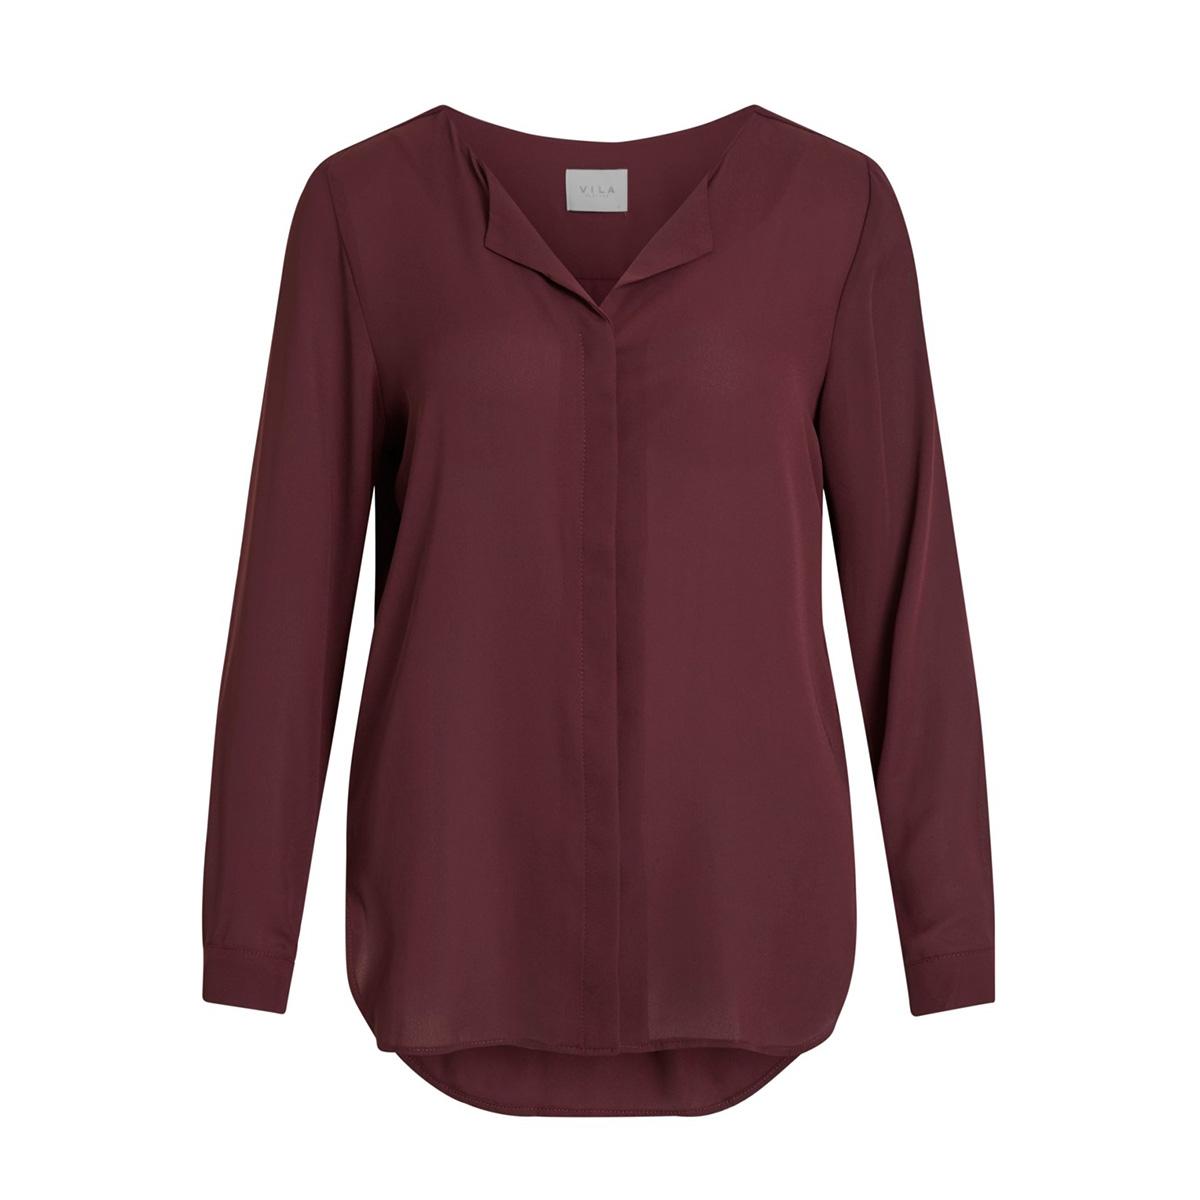 vilucy l/s shirt - noos 14044253 vila blouse winetasting